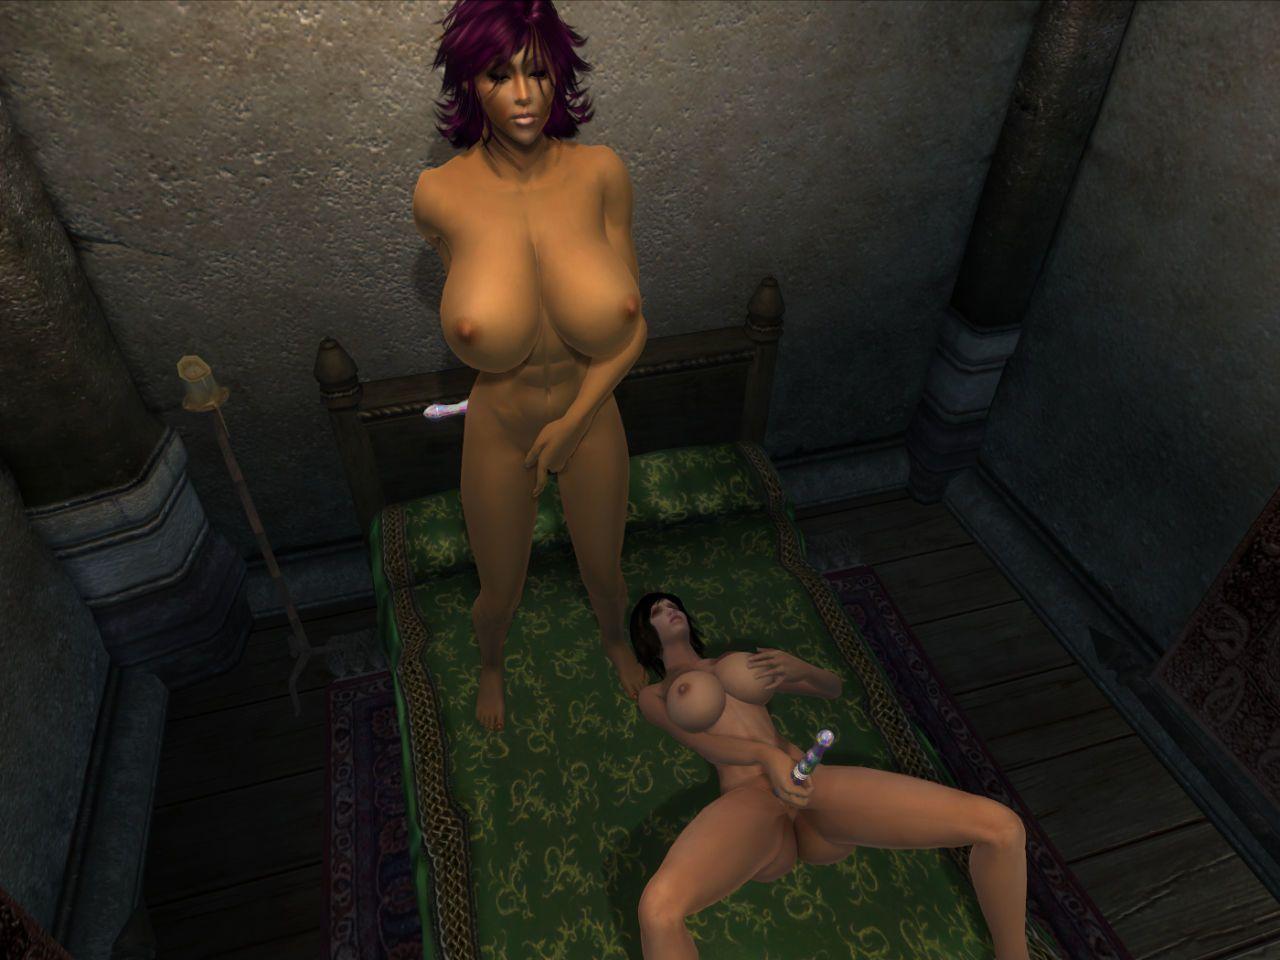 [Chaisy] Oblivion Strap-on Sex (The Elder Scrolls: Oblivion)